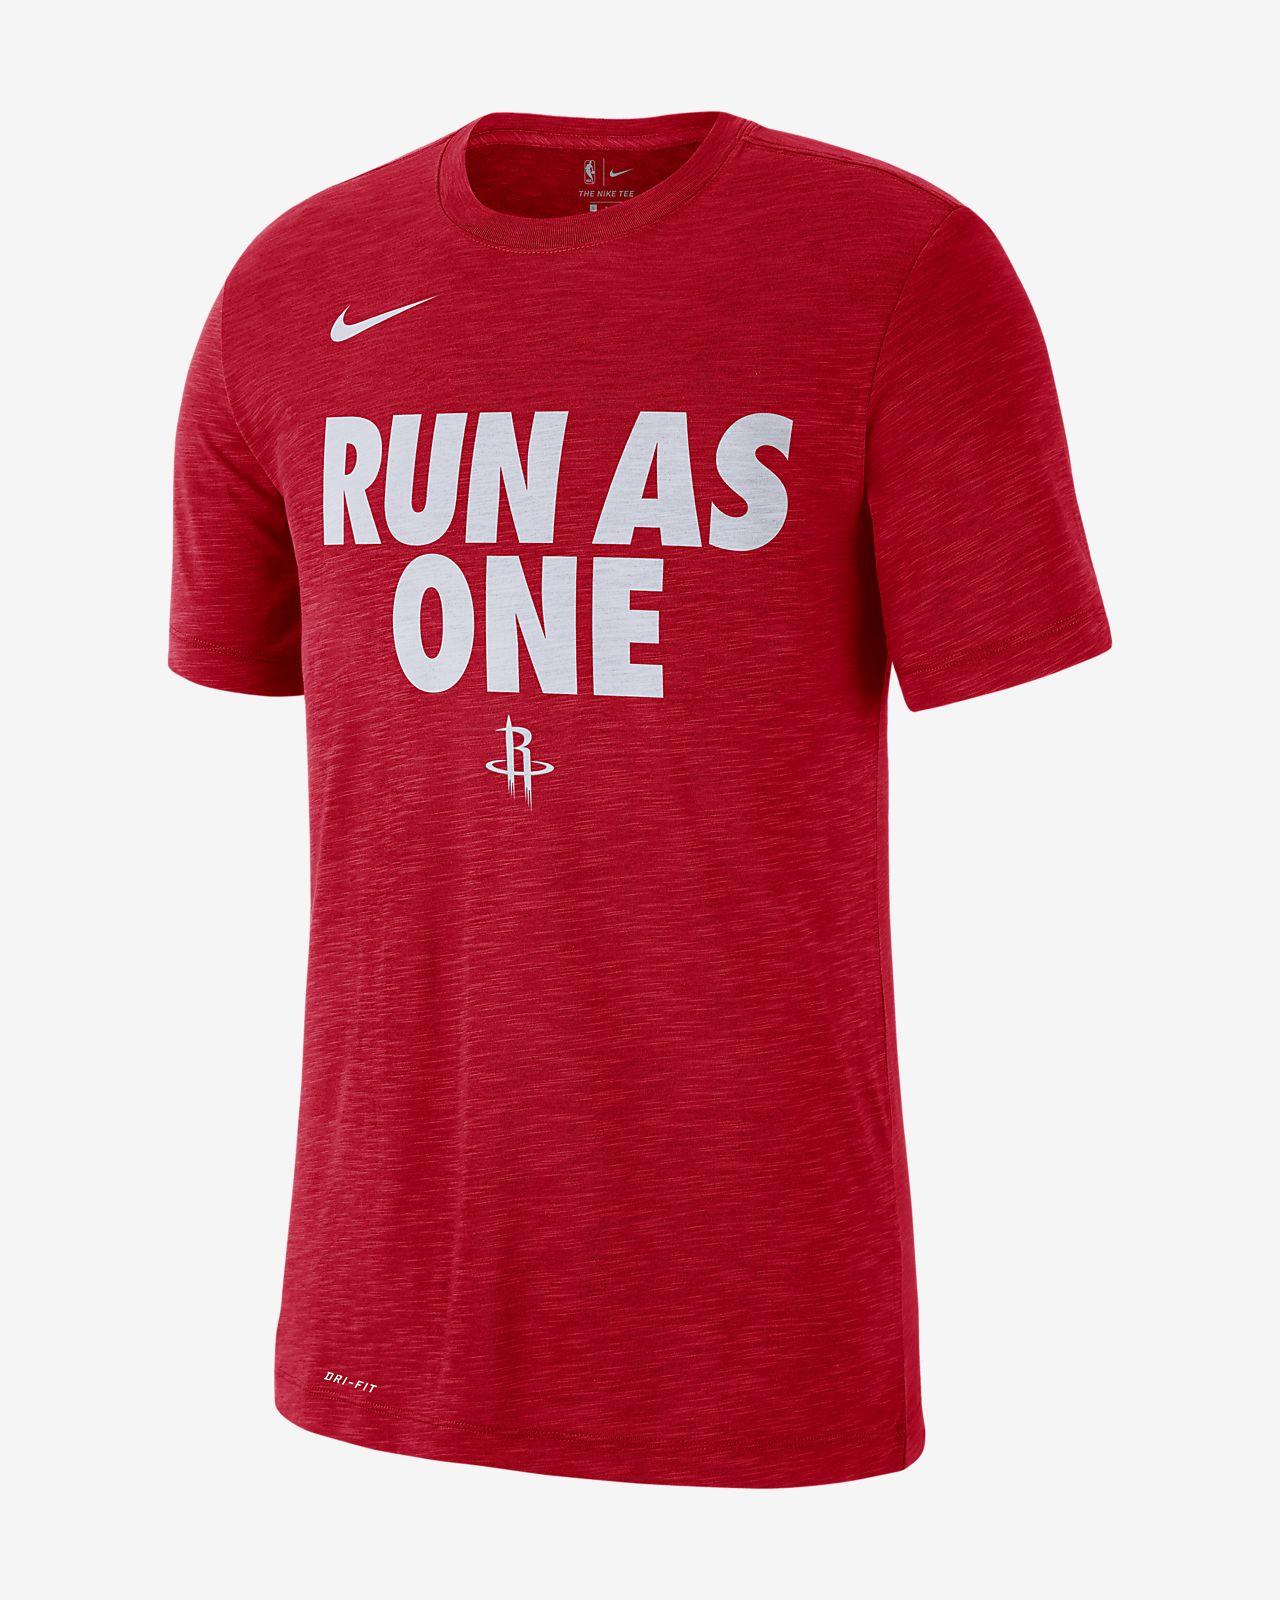 7eecad0cb06eef Houston Rockets Nike Dri Fit Men S Nba T Shirt Nike Com